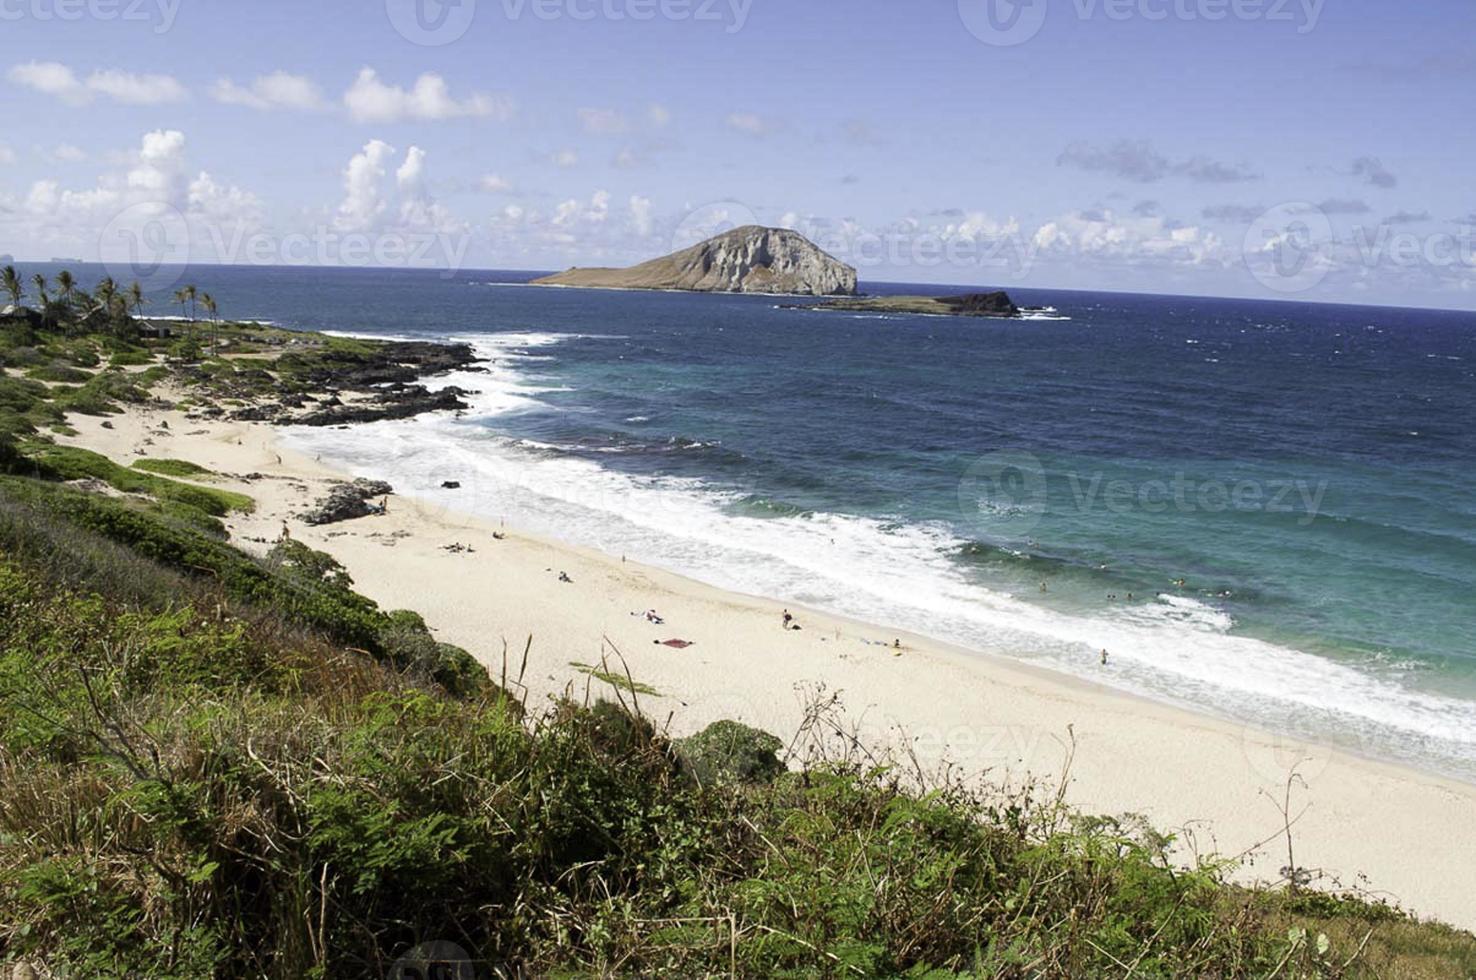 Makapu'u beach vista on a sunny veach day. photo